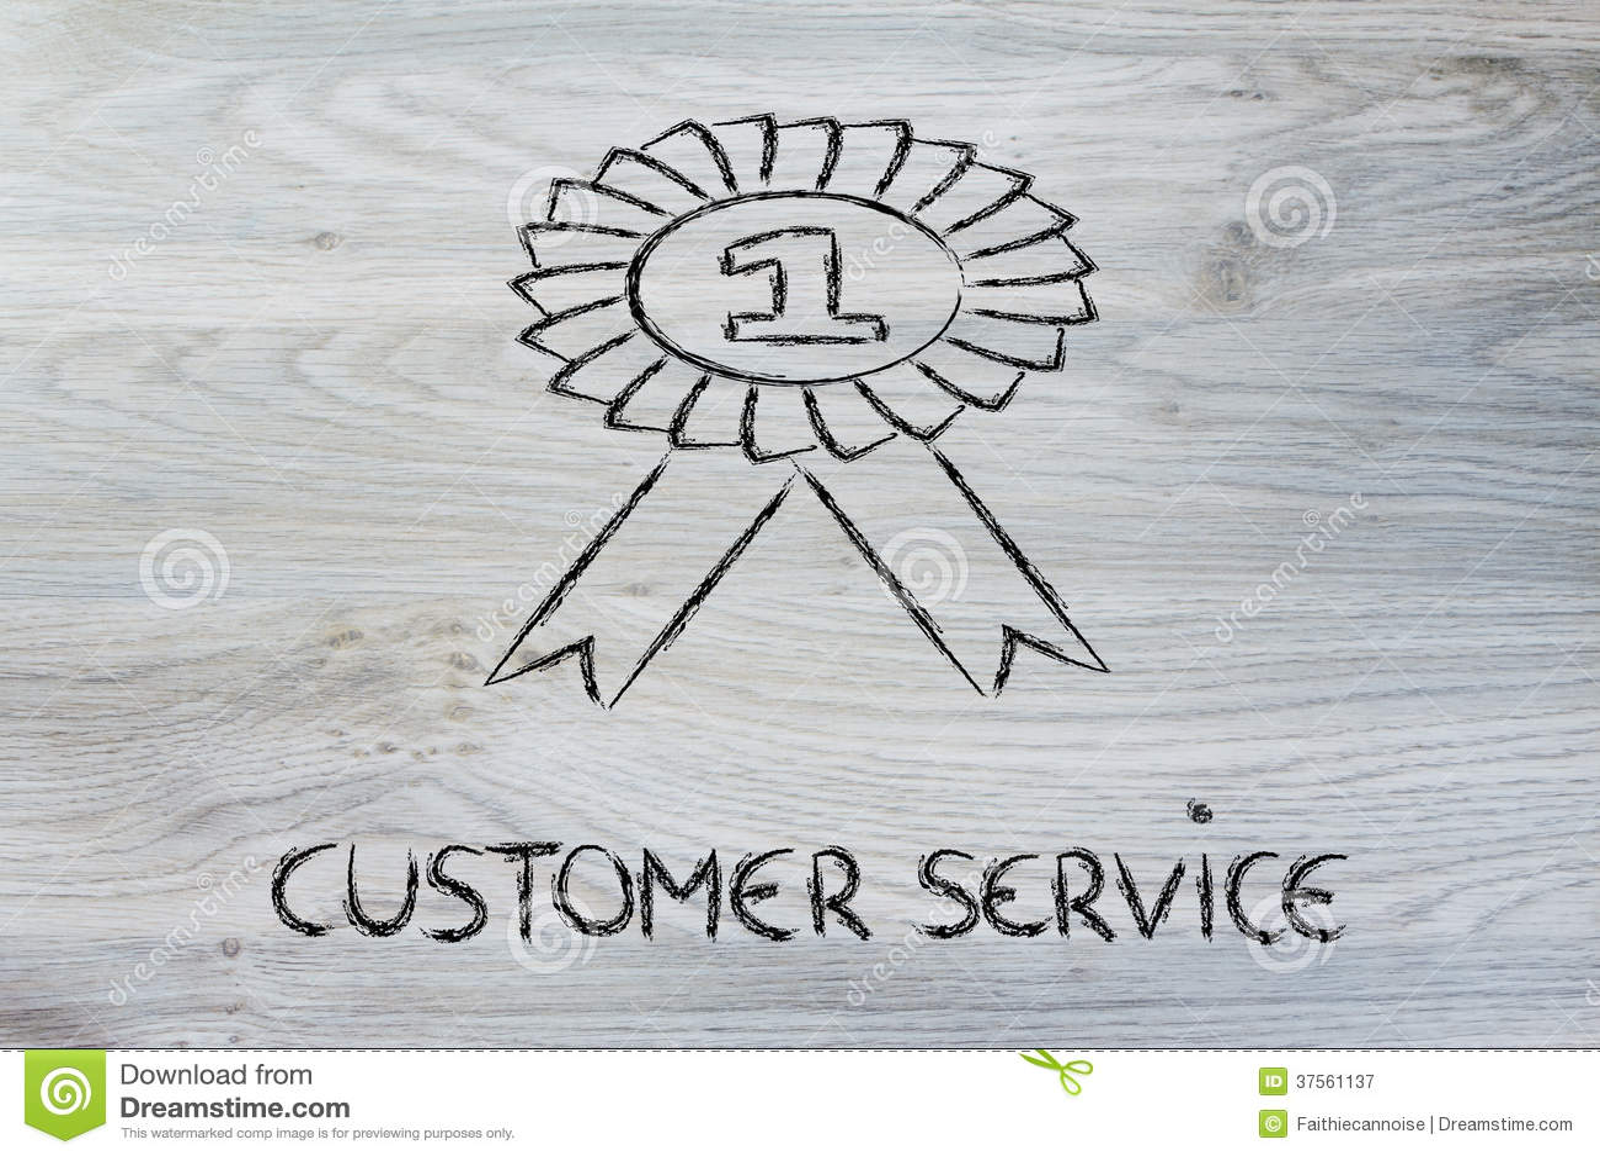 popular majors craigslist customer service number